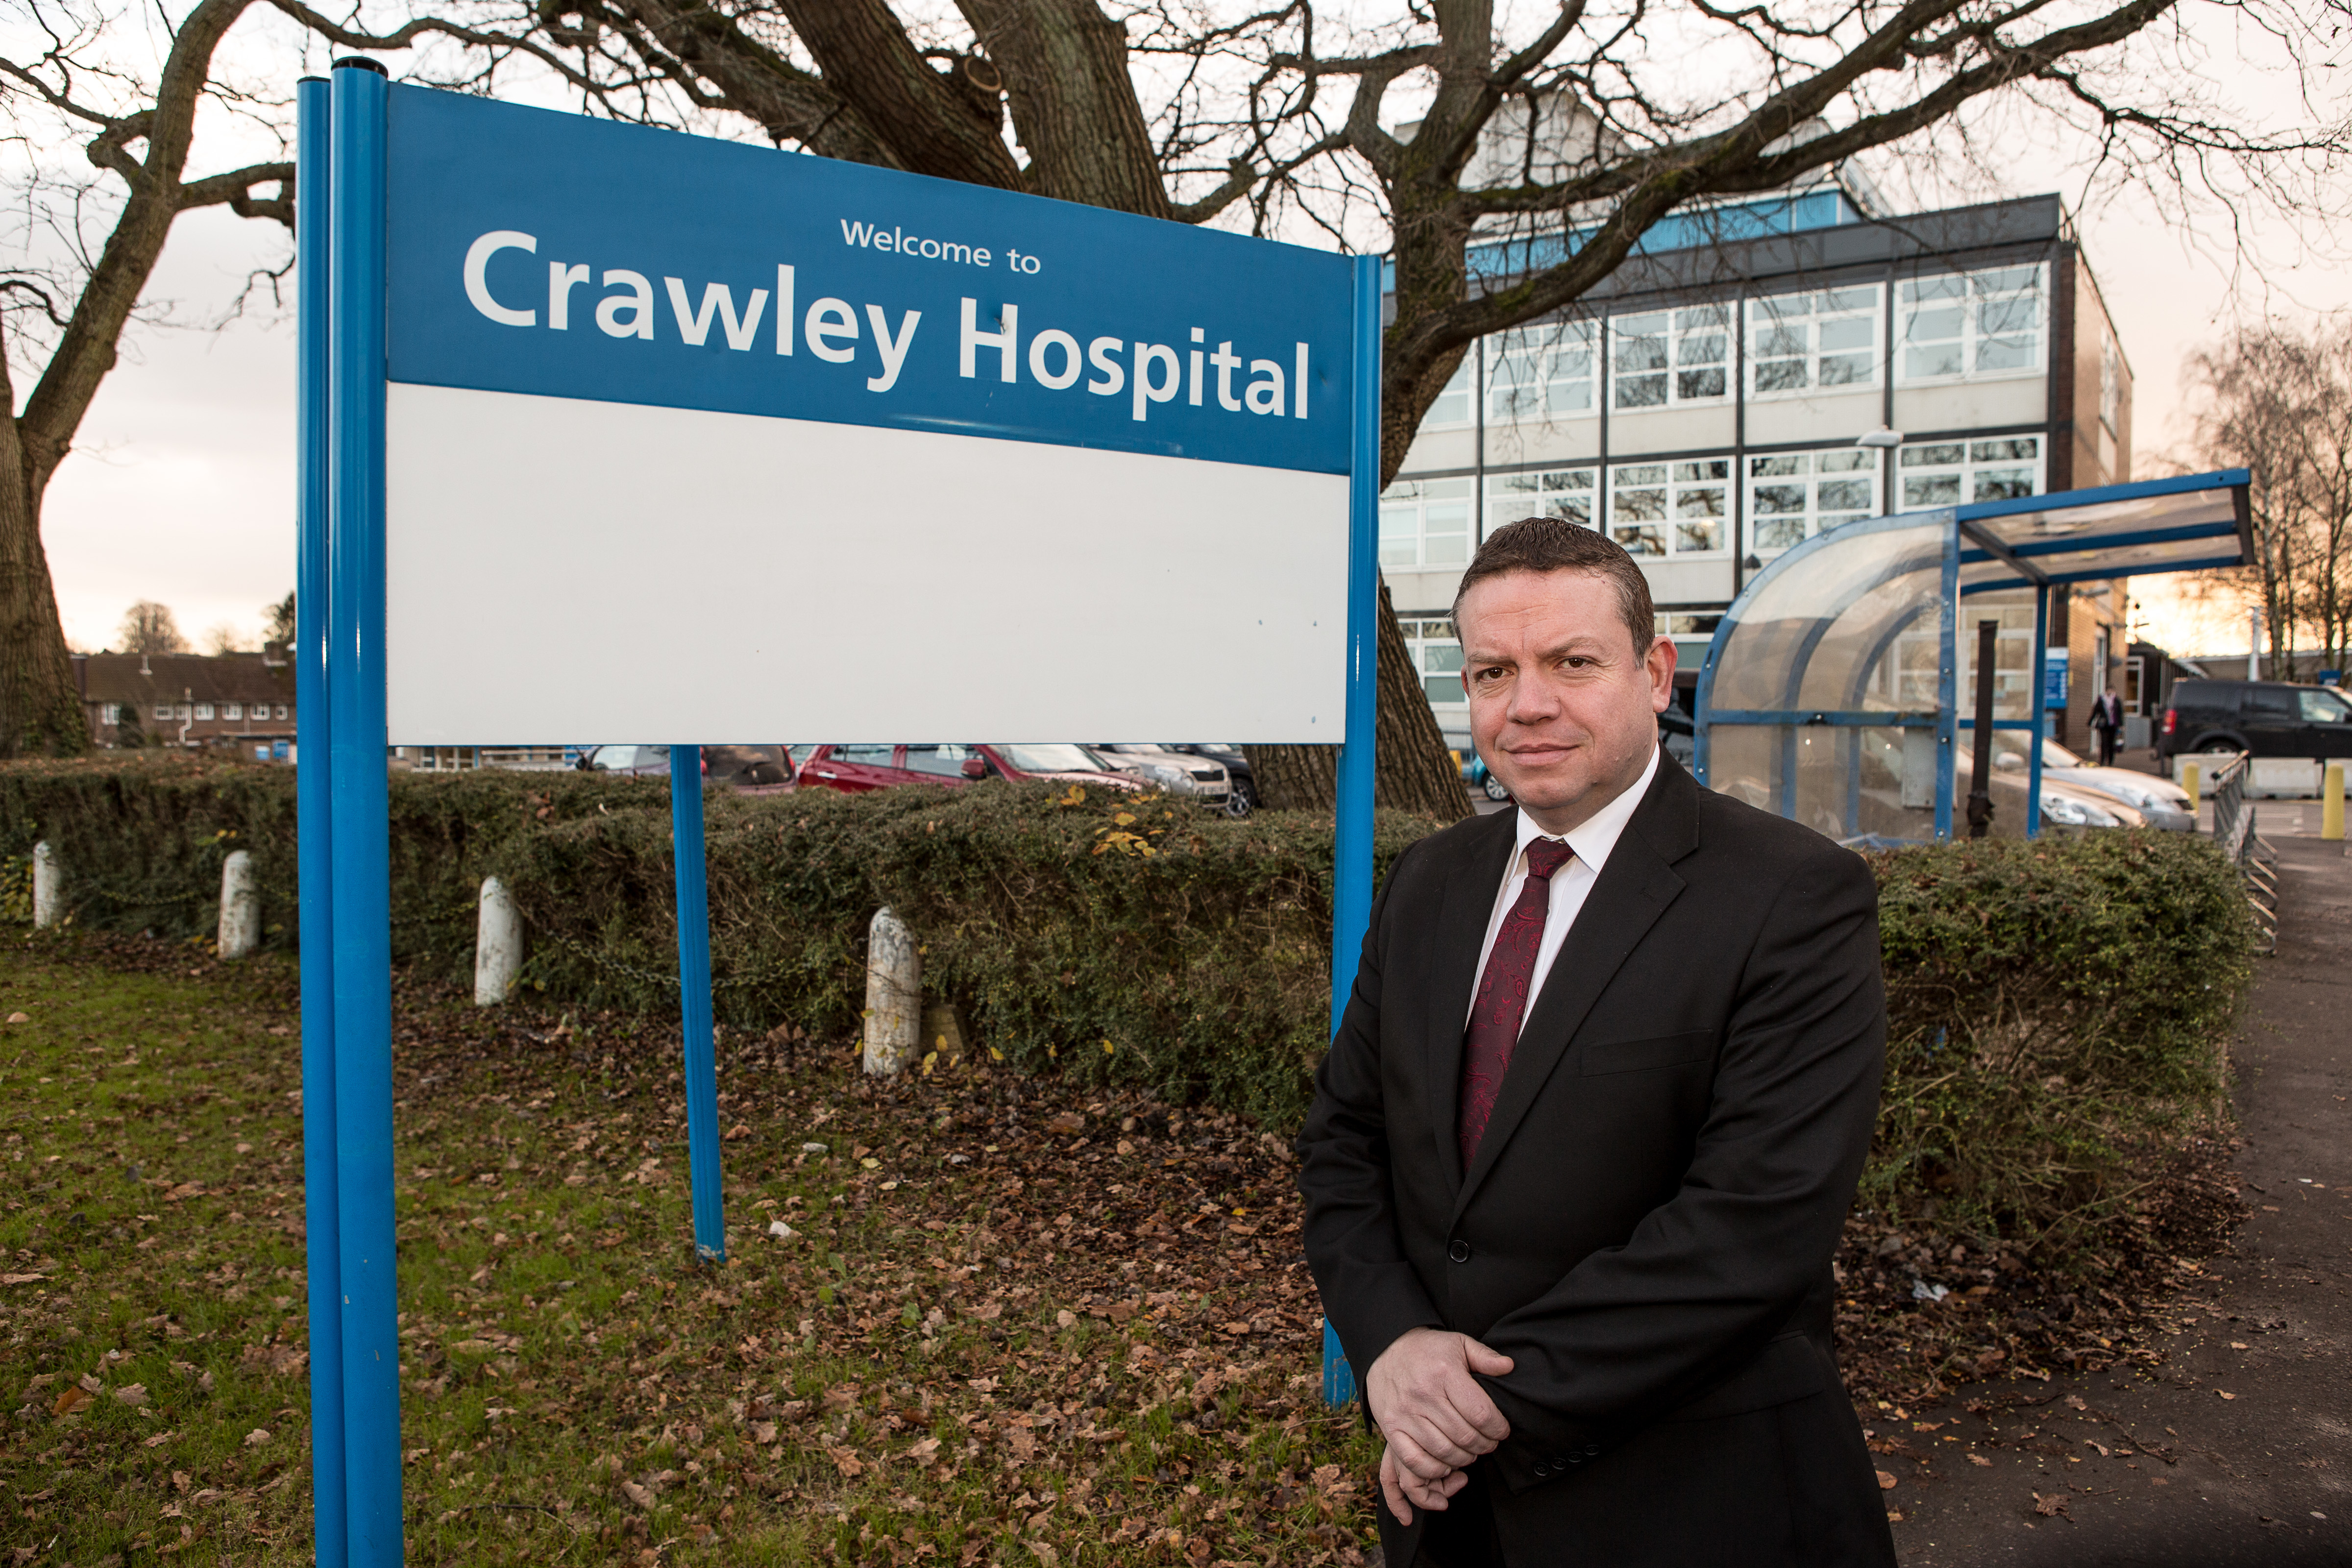 Chris_outside_Crawley_Hospital.jpg